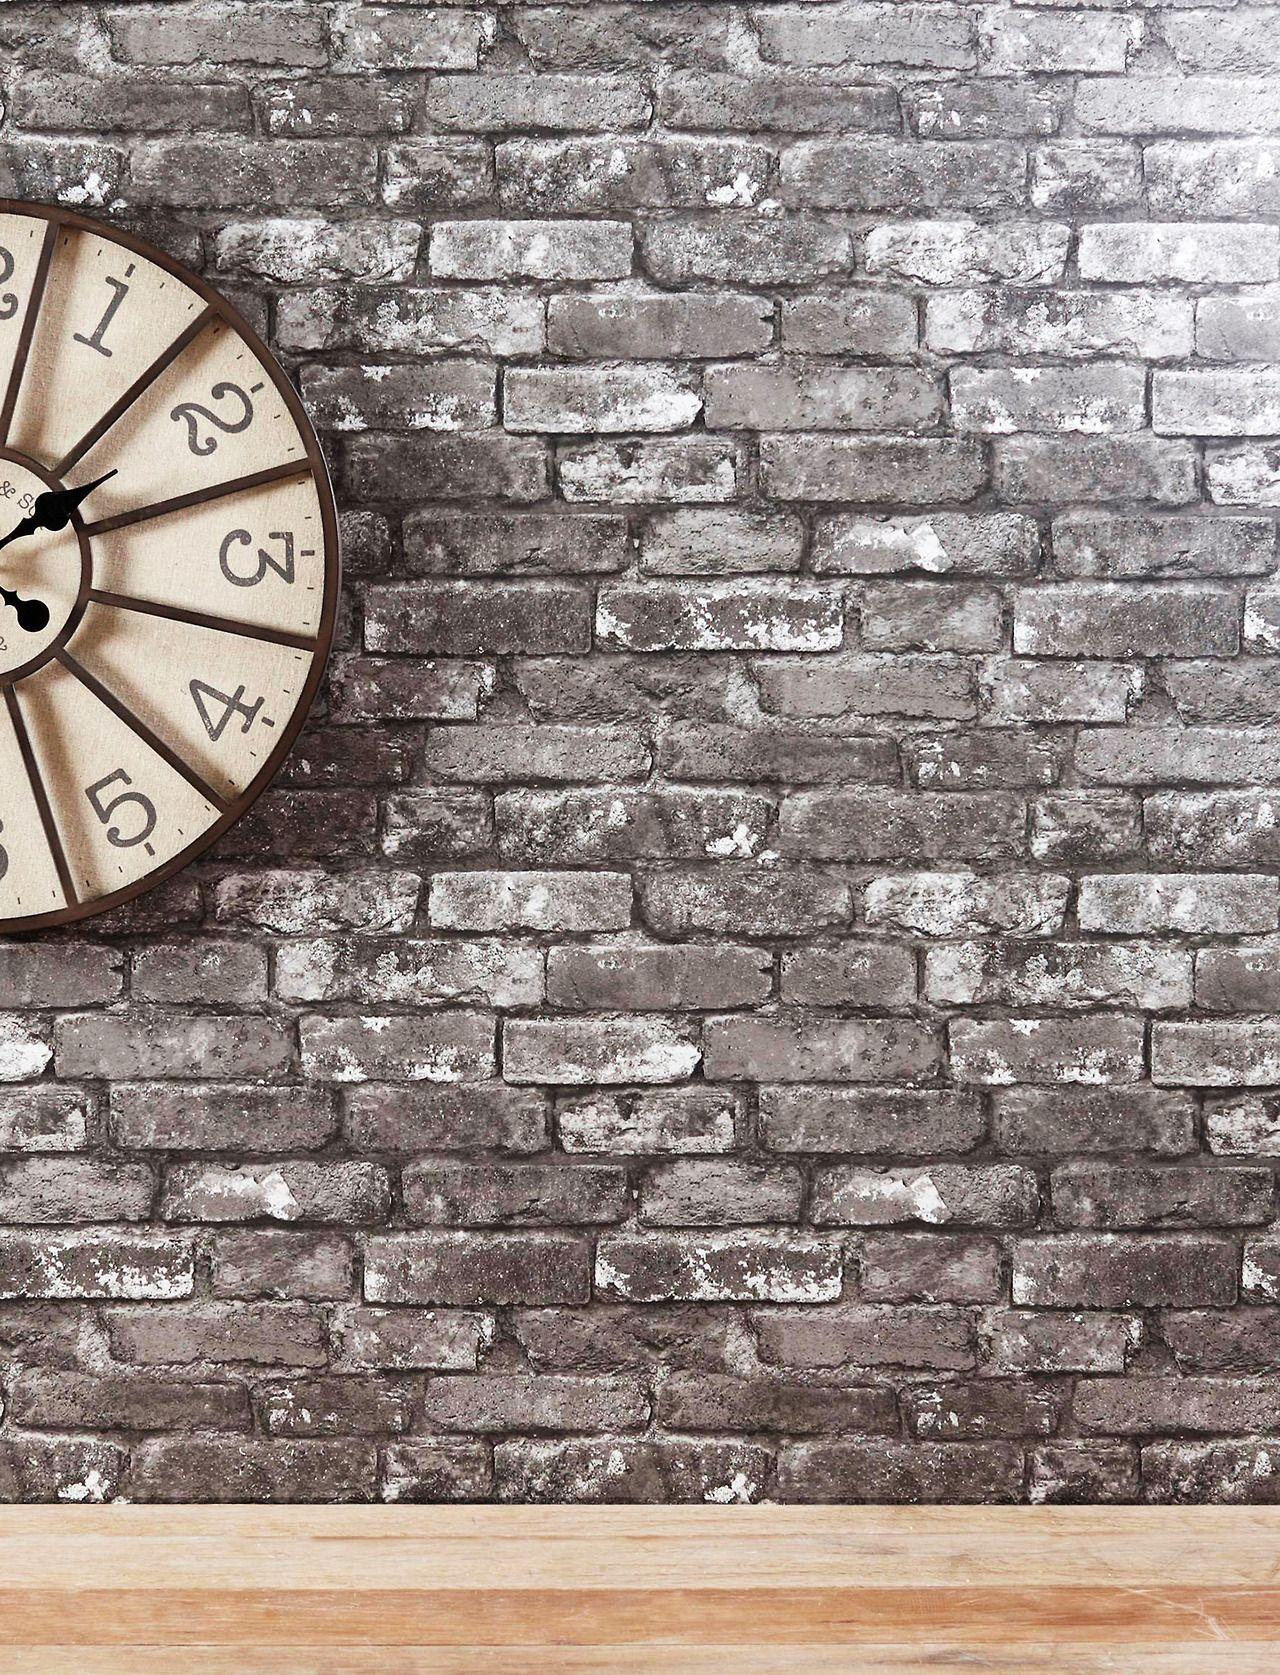 Grey Brick Wallpaper From Next Brick Wallpaper Brick Wallpaper Bedroom Brick Effect Wallpaper